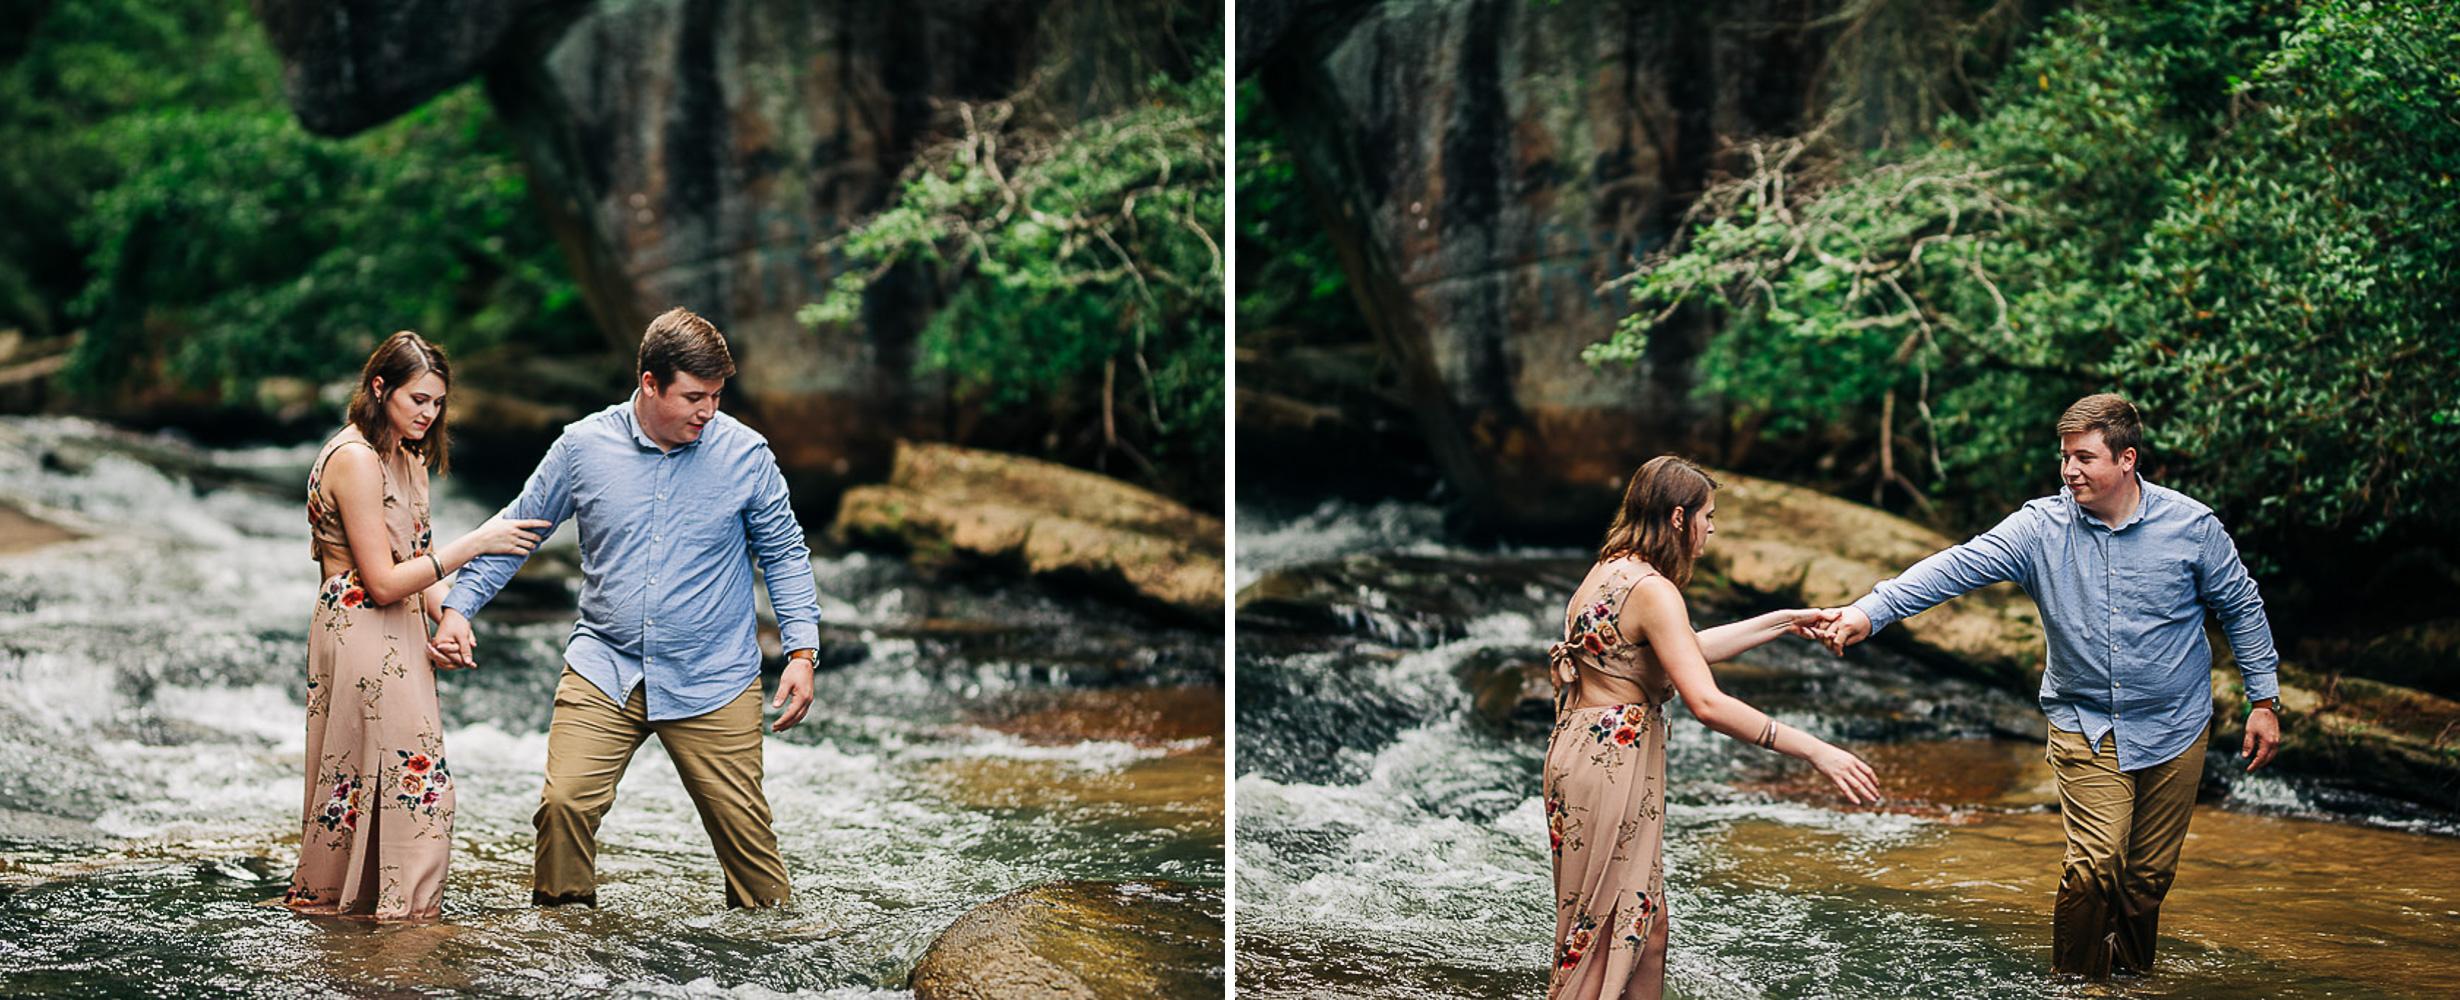 River Engagement Portraits, Summer Engagement Portraits, Engaged, South Carolina 16.jpg